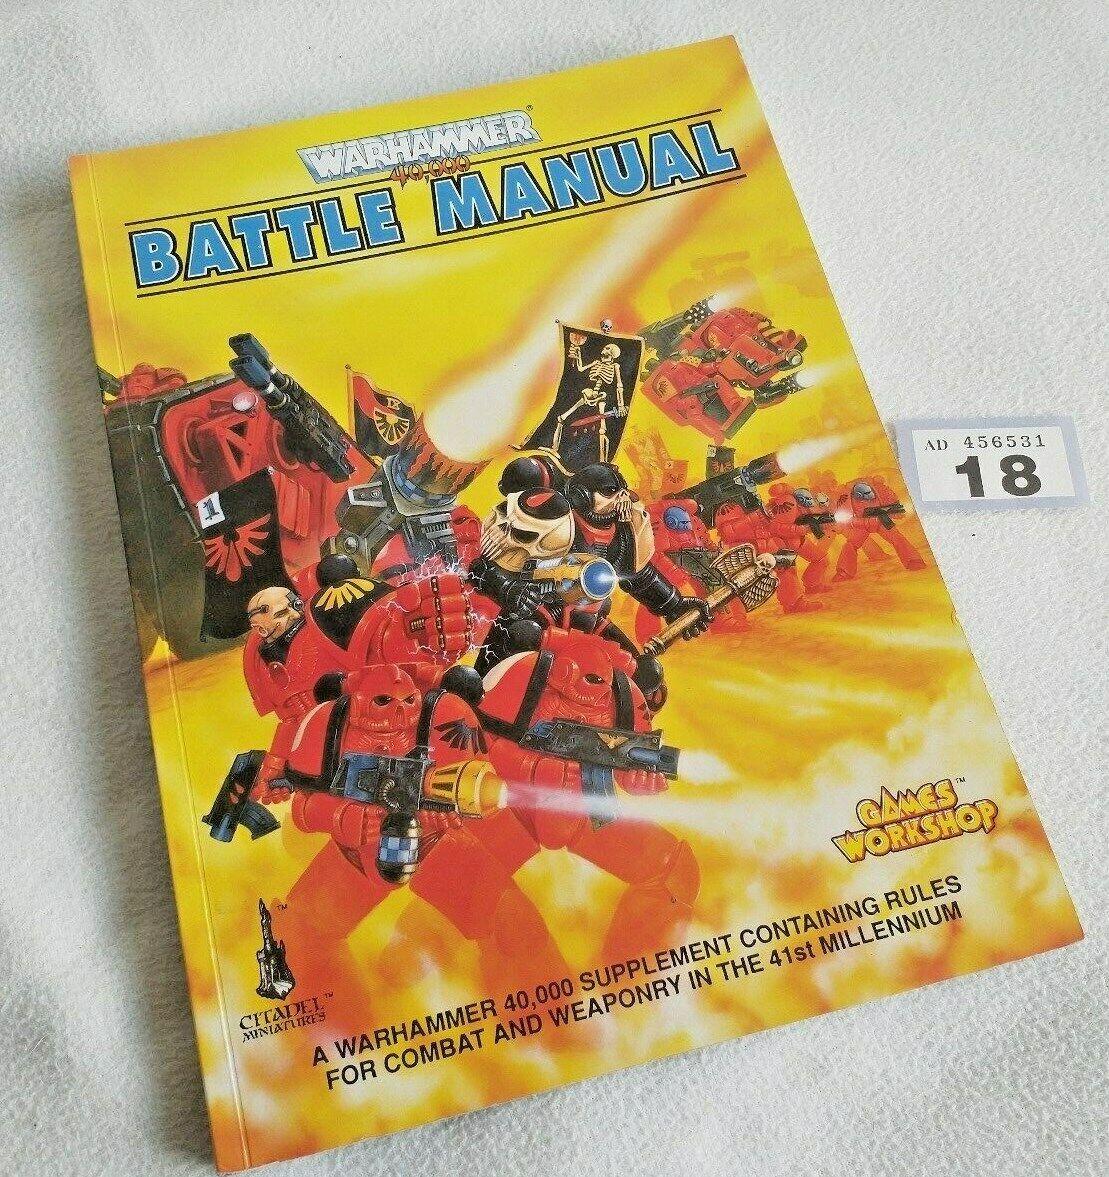 Warhammer 40,000 ROGUE TRADER Battle Manual RARE OOP WH40K 40K (018)